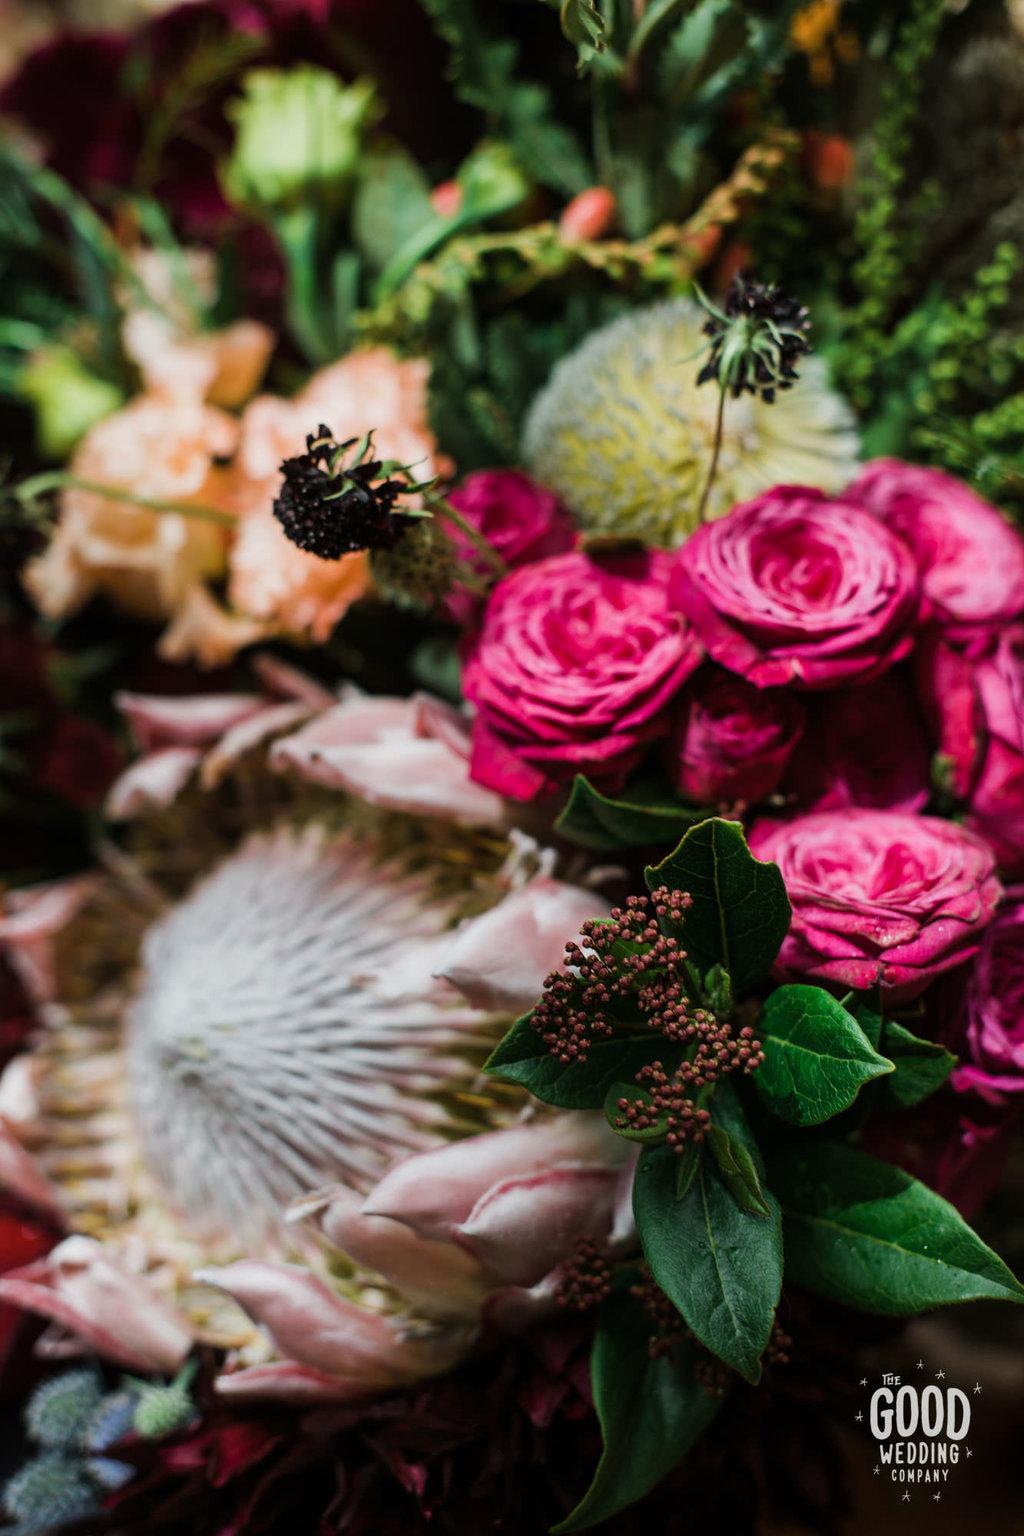 The-Good-Wedding-Company-JessKyle-Queenstown-wedding-photographer-37.jpg